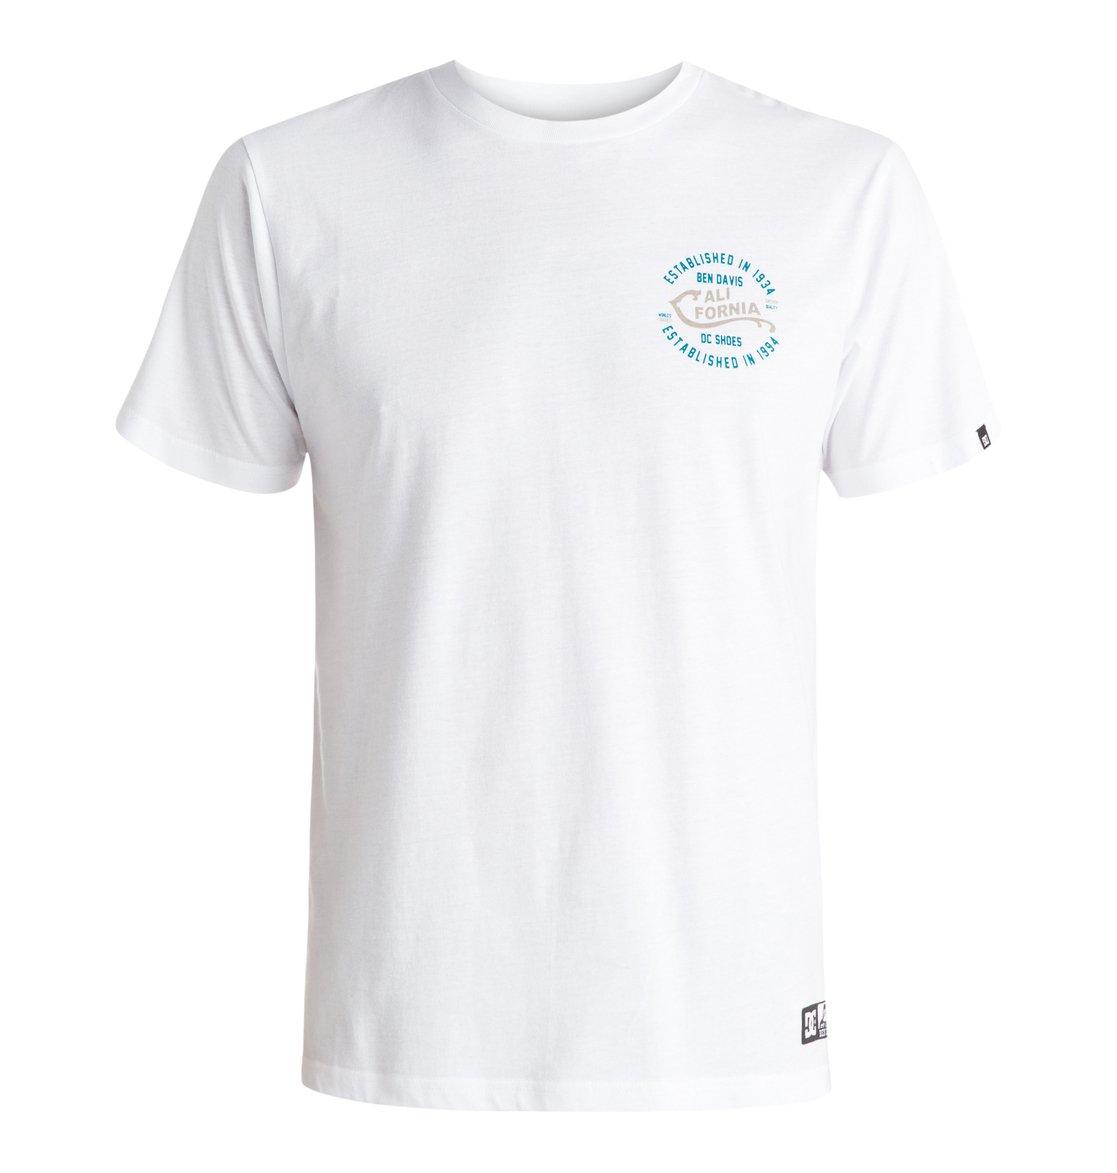 Califorya T-ShirtМужская футболка Califorya от DC Shoes. <br>ХАРАКТЕРИСТИКИ: коллаборация DC x Ben Davis, стандартный крой, мягкий графический принт. <br>СОСТАВ: 100% хлопок.<br>